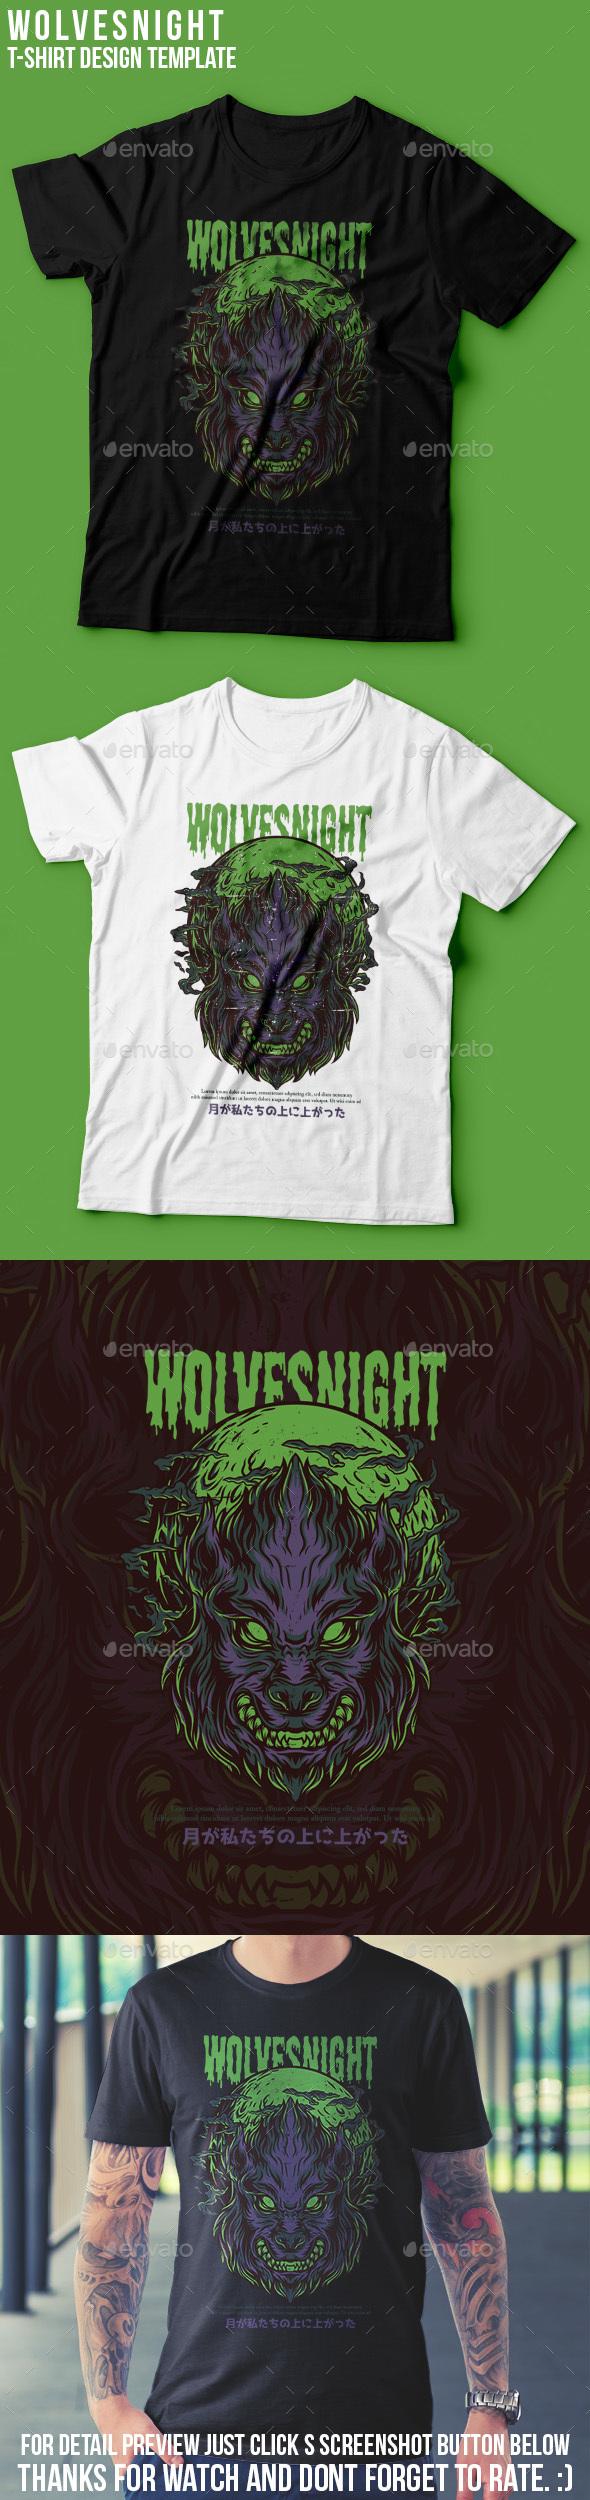 Wolves Night T-Shirt Design